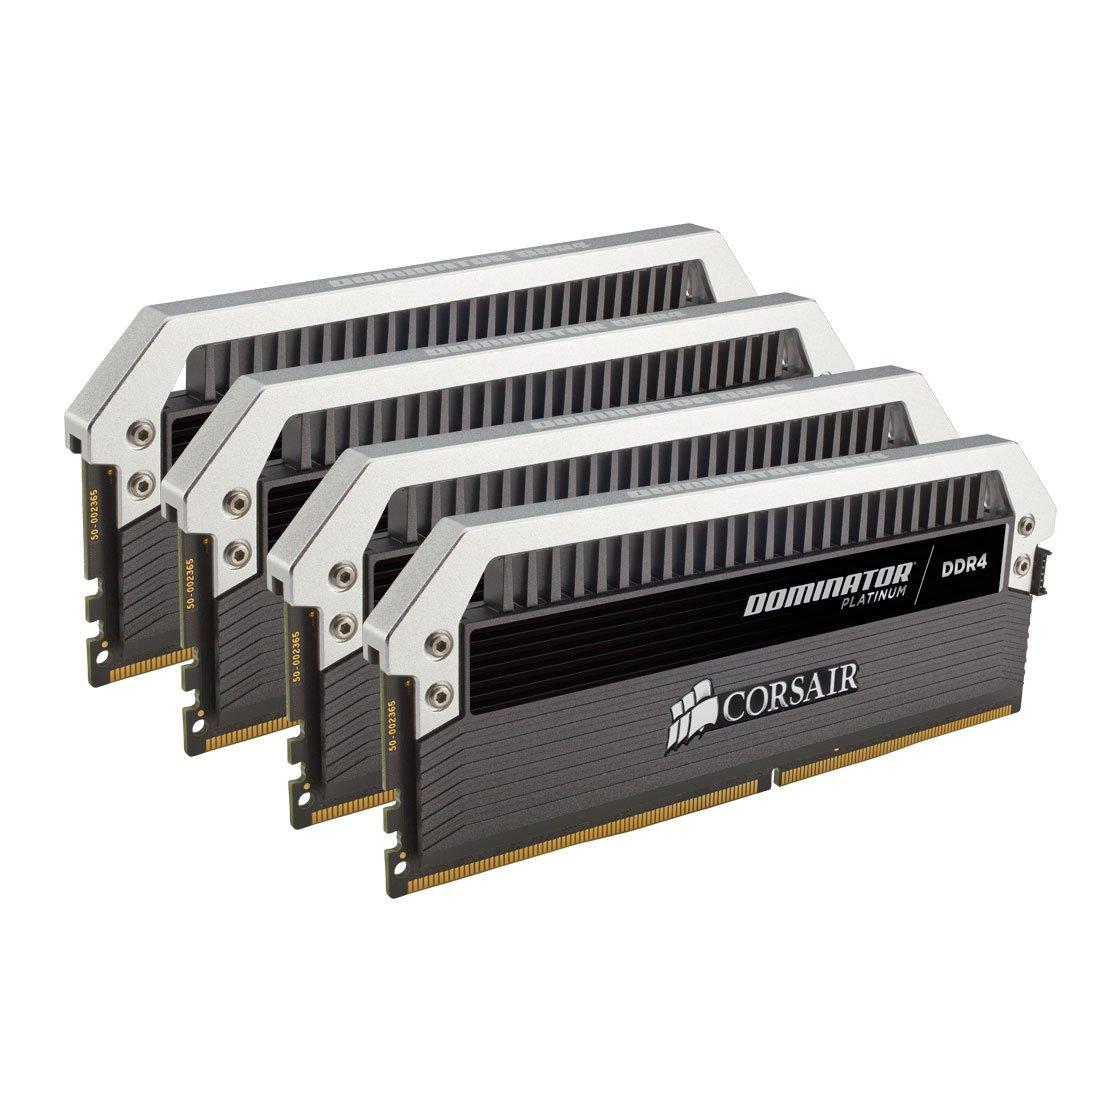 64GB (4 x 16GB) Corsair Dominator Platinum DDR4 3200 Mhz C16 XMP 2.0 Ram £410.39 @ Amazon